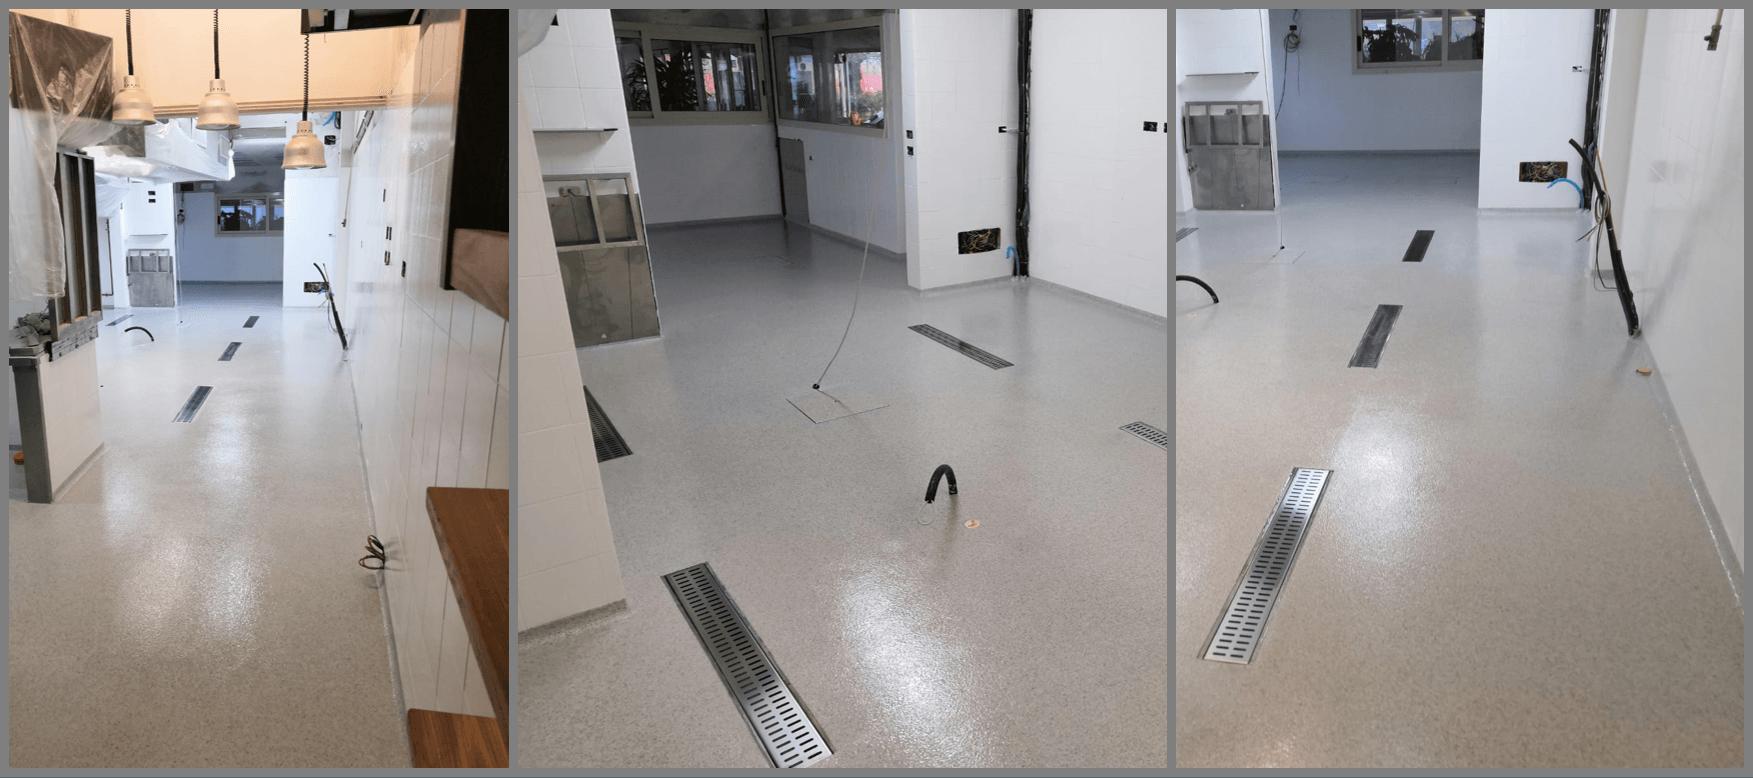 pavimentazione in resina cucina ristorante